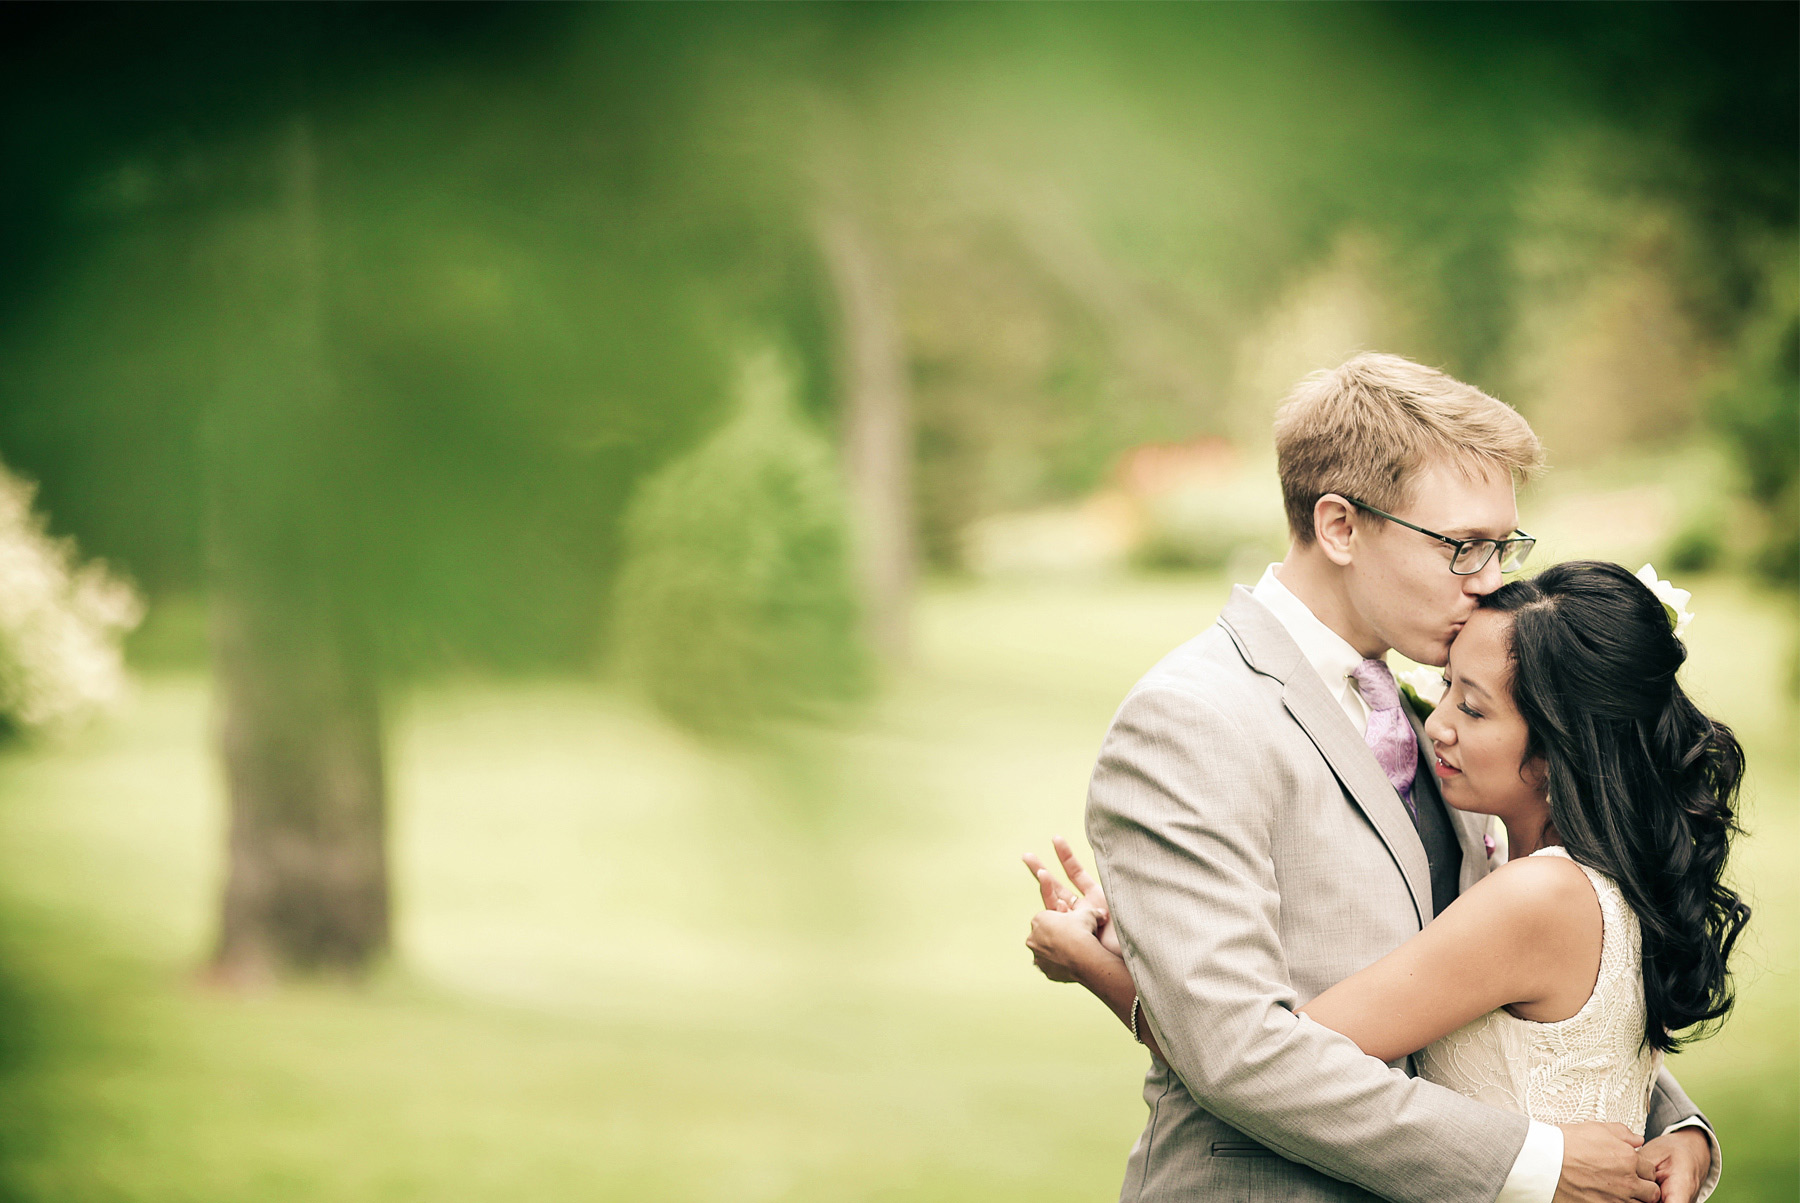 05-Minneapolis-Minnesota-Wedding-Photography-by-Vick-Photography-Garden-First-Look-Daphne-&-Austin.jpg